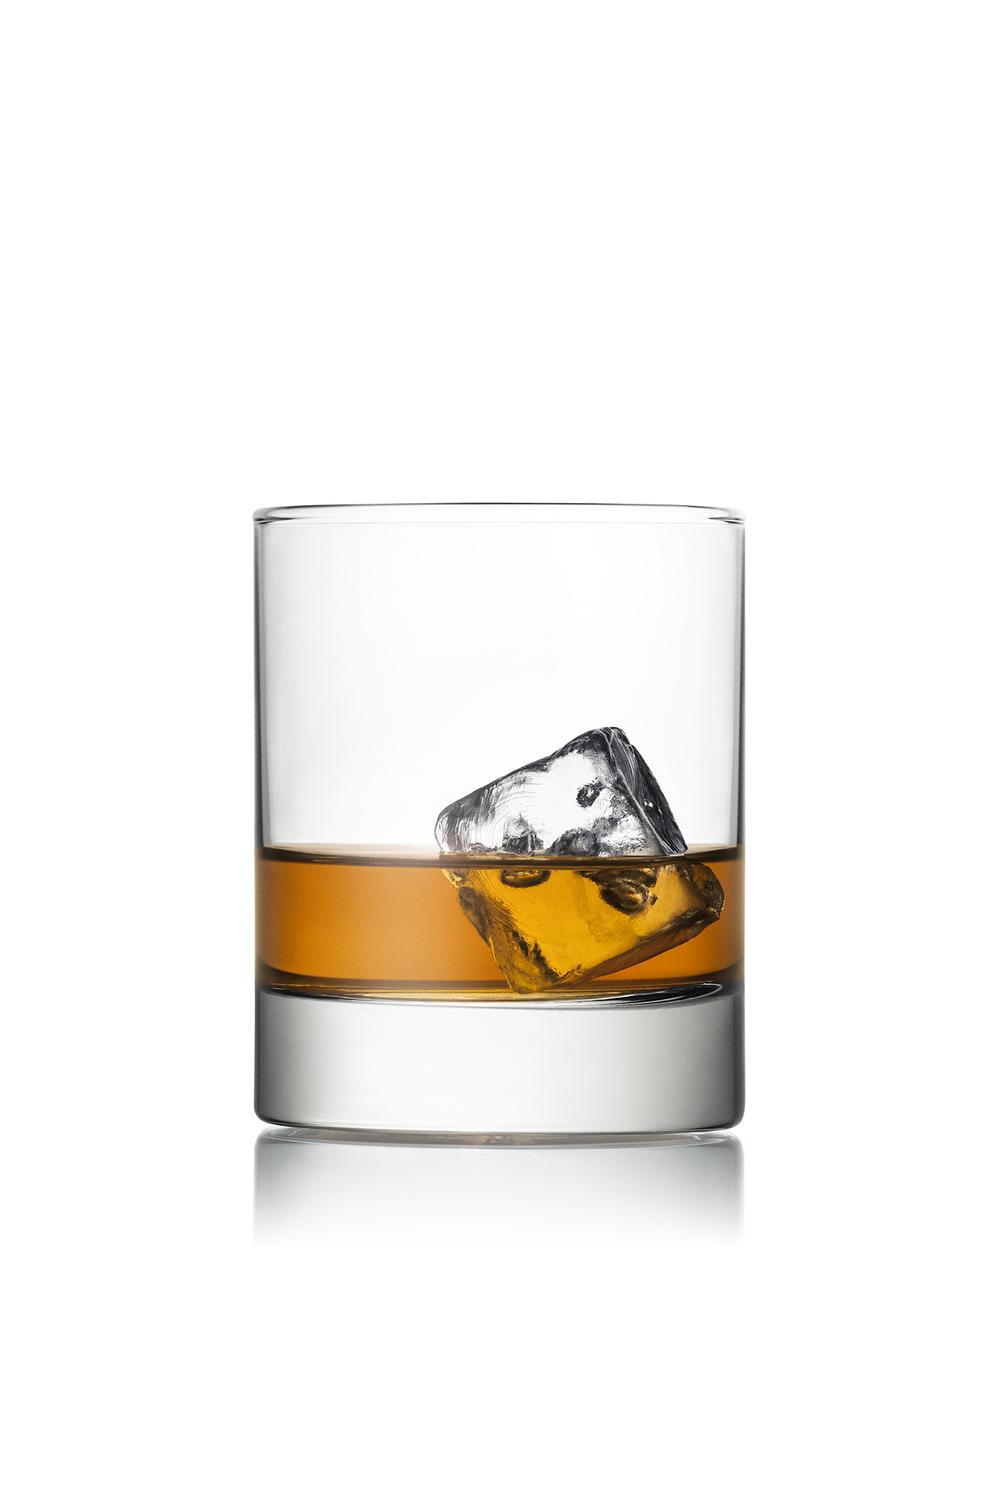 Scotch_0063_Finale.jpg